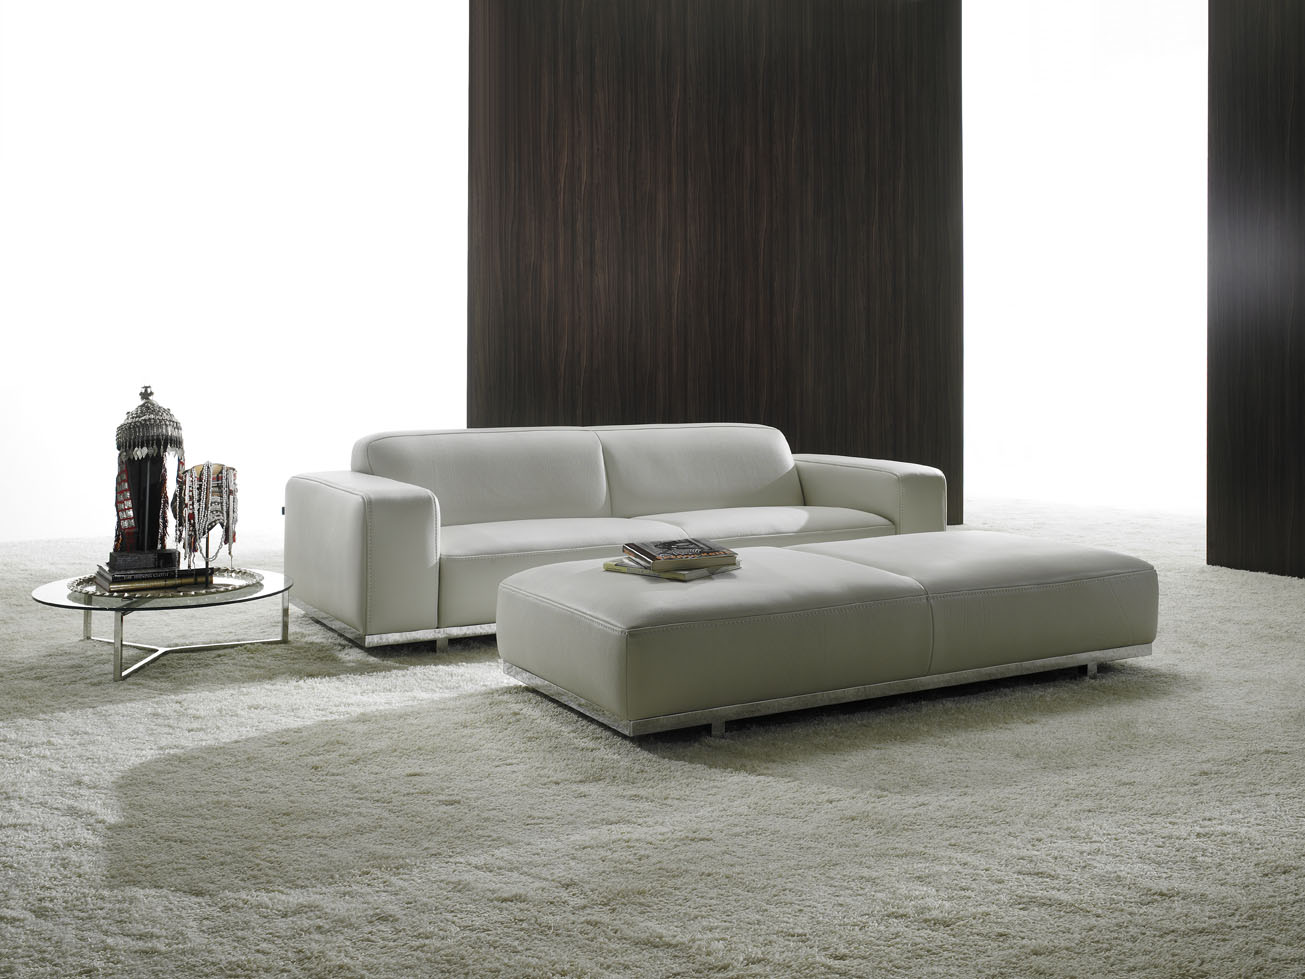 Ikea Sofa Bed Design To Invite More Chance To Sleep